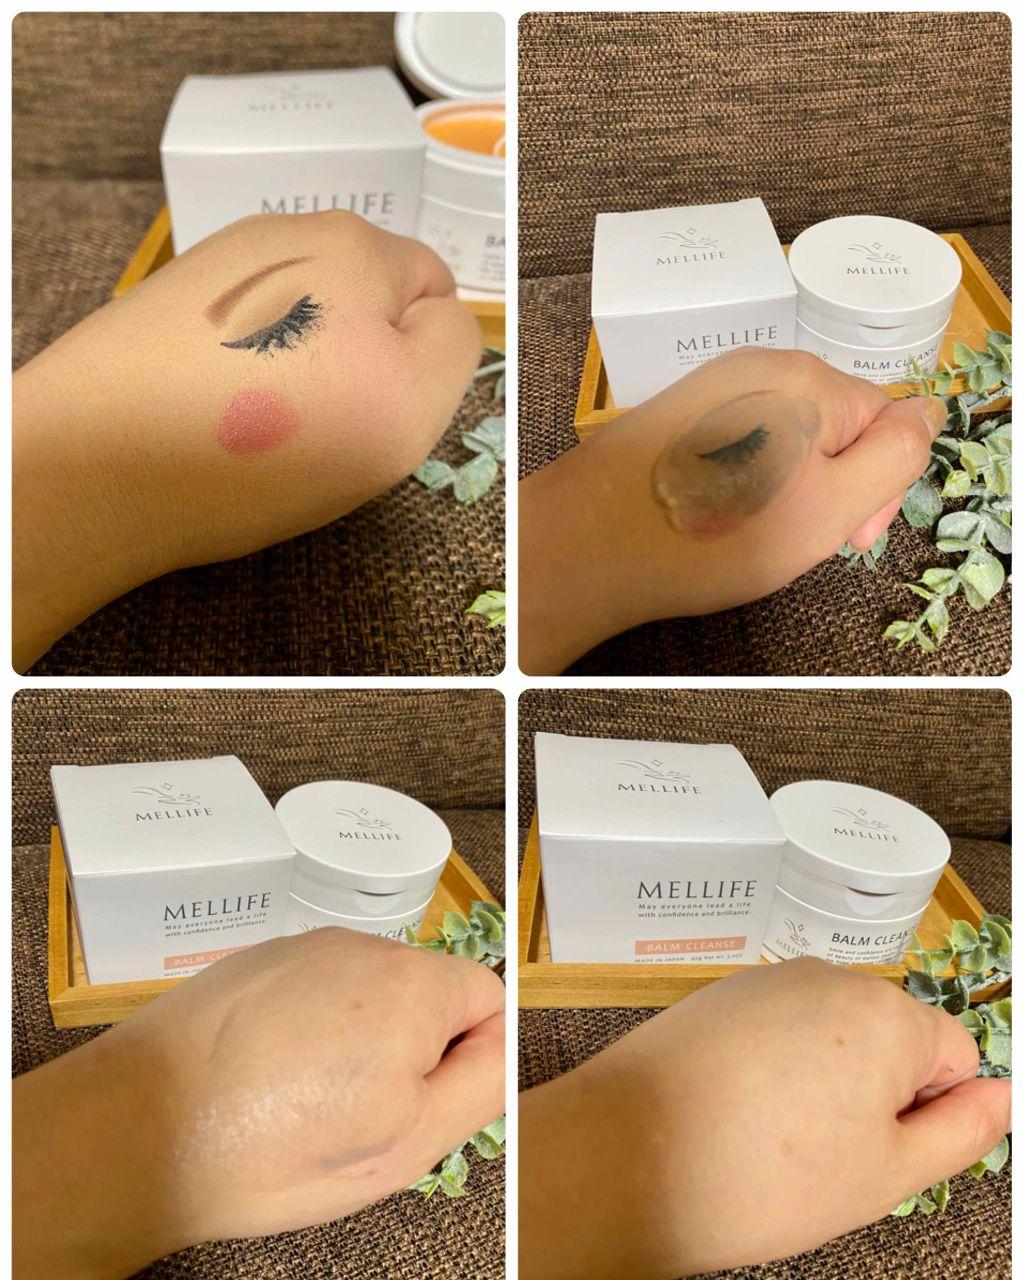 BALM CLEANSE|MELLIFEの口コミ「【MELLIFE(メリフ)BALMCLEA..」 by ようちゃん(混合肌) | LIPS